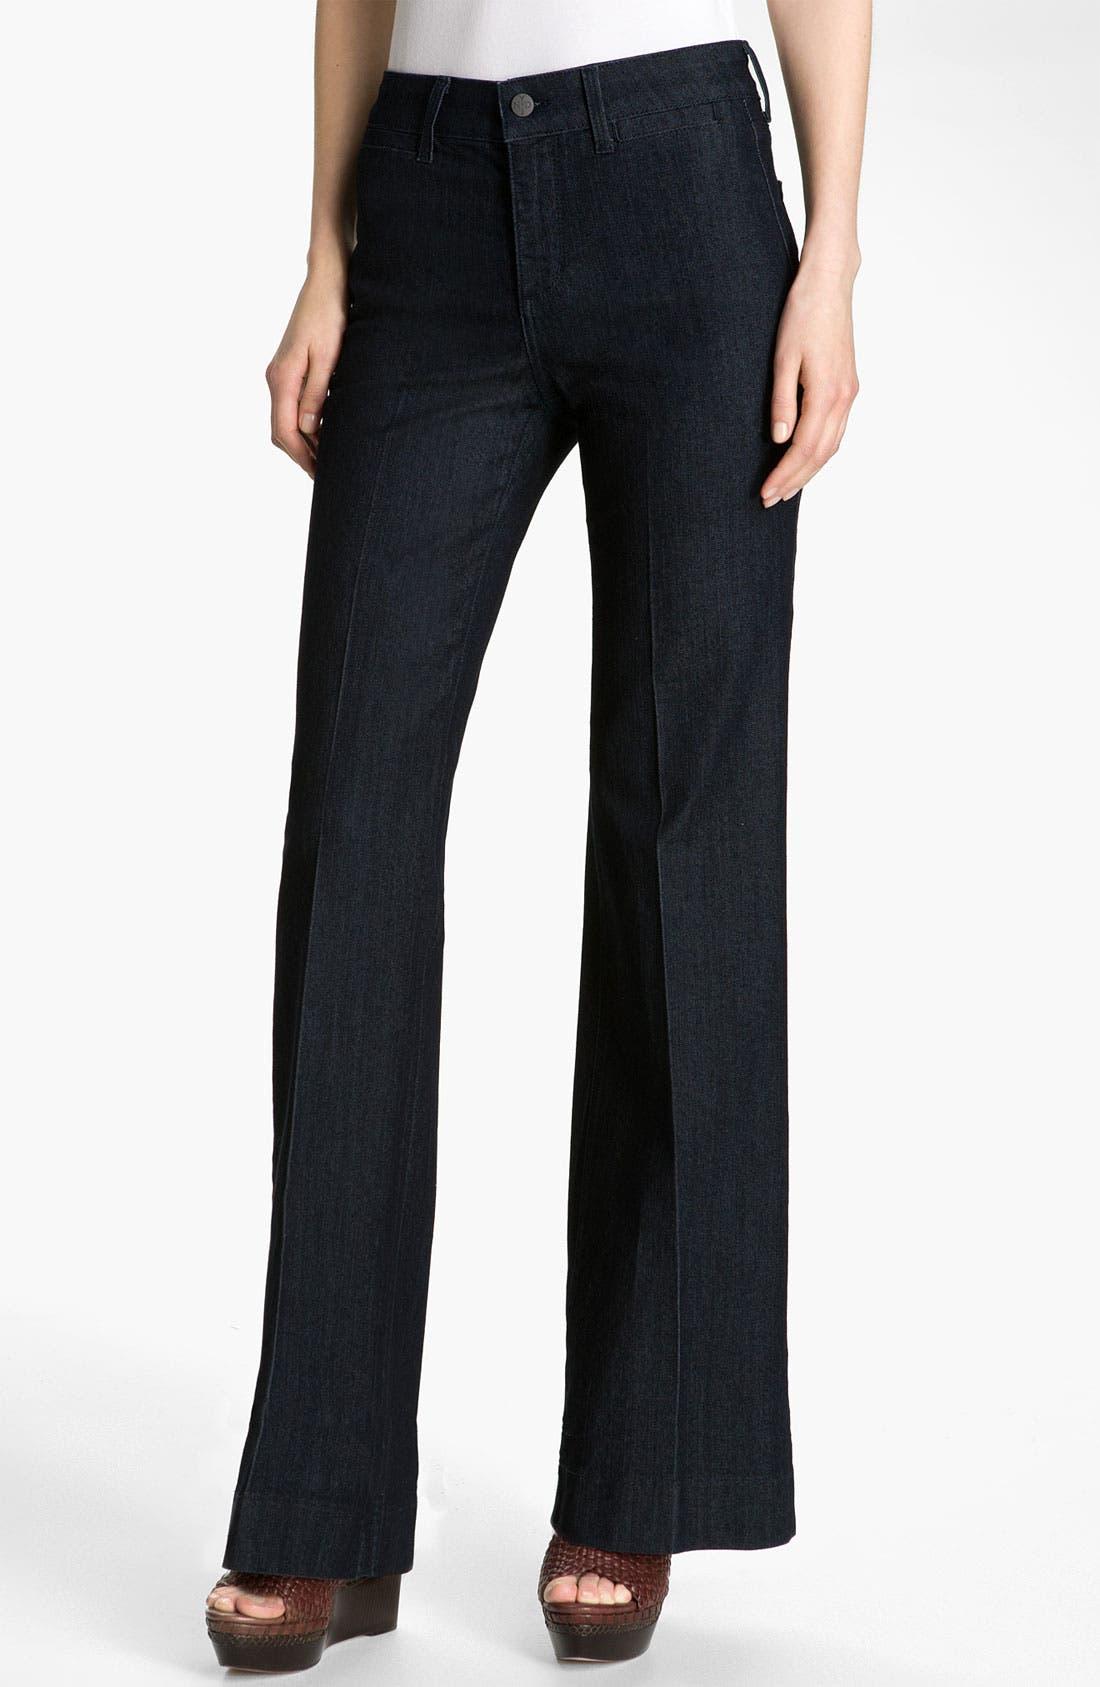 Main Image - NYDJ 'Greta' Trouser Jeans (Petite)